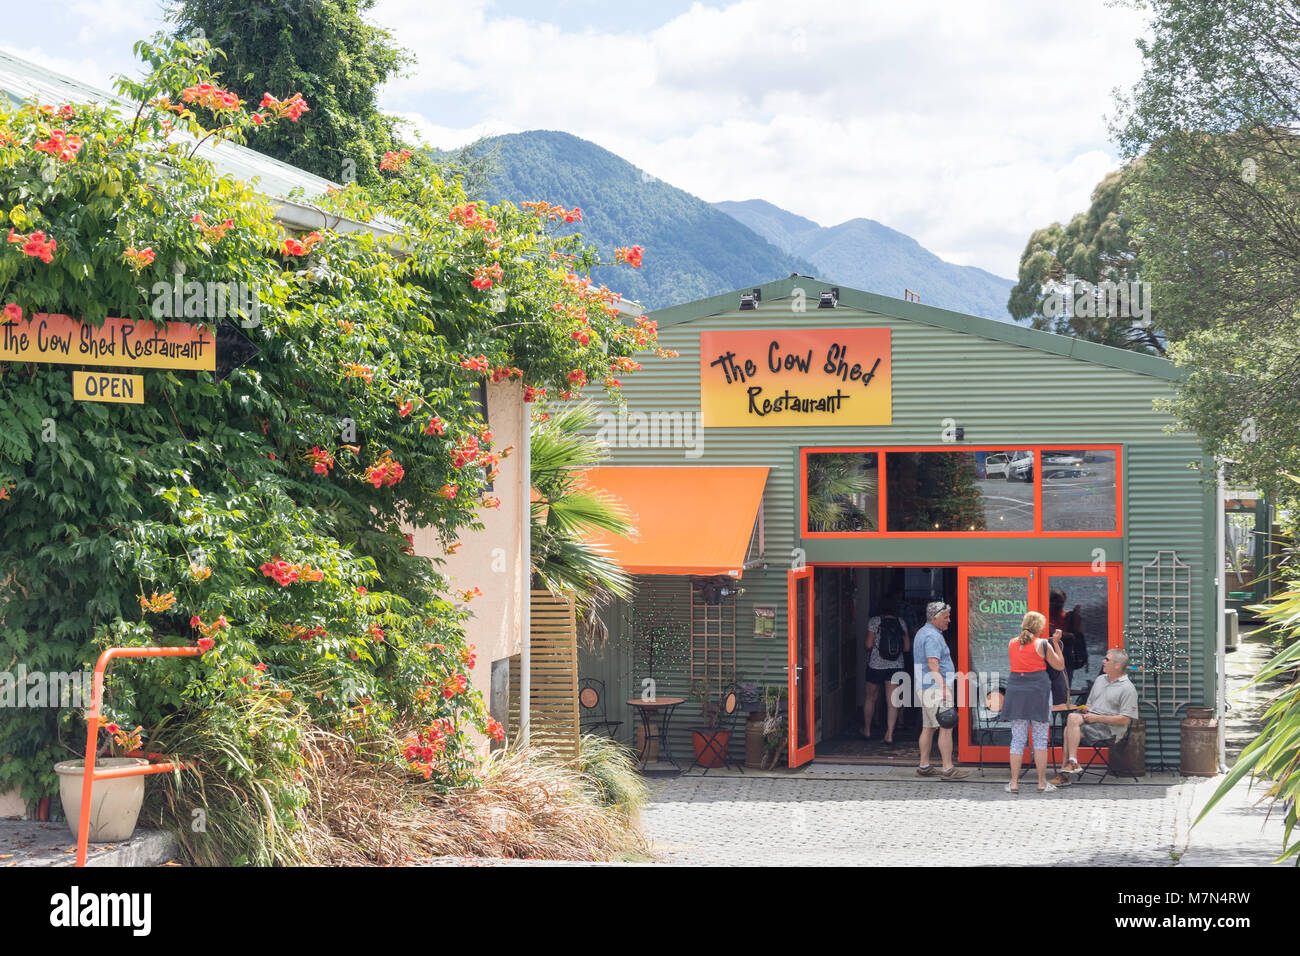 The Cow Shed Restaurant, Waller Street (State Highway 6), Murchison, Tasman Region, New Zealand - Stock Image